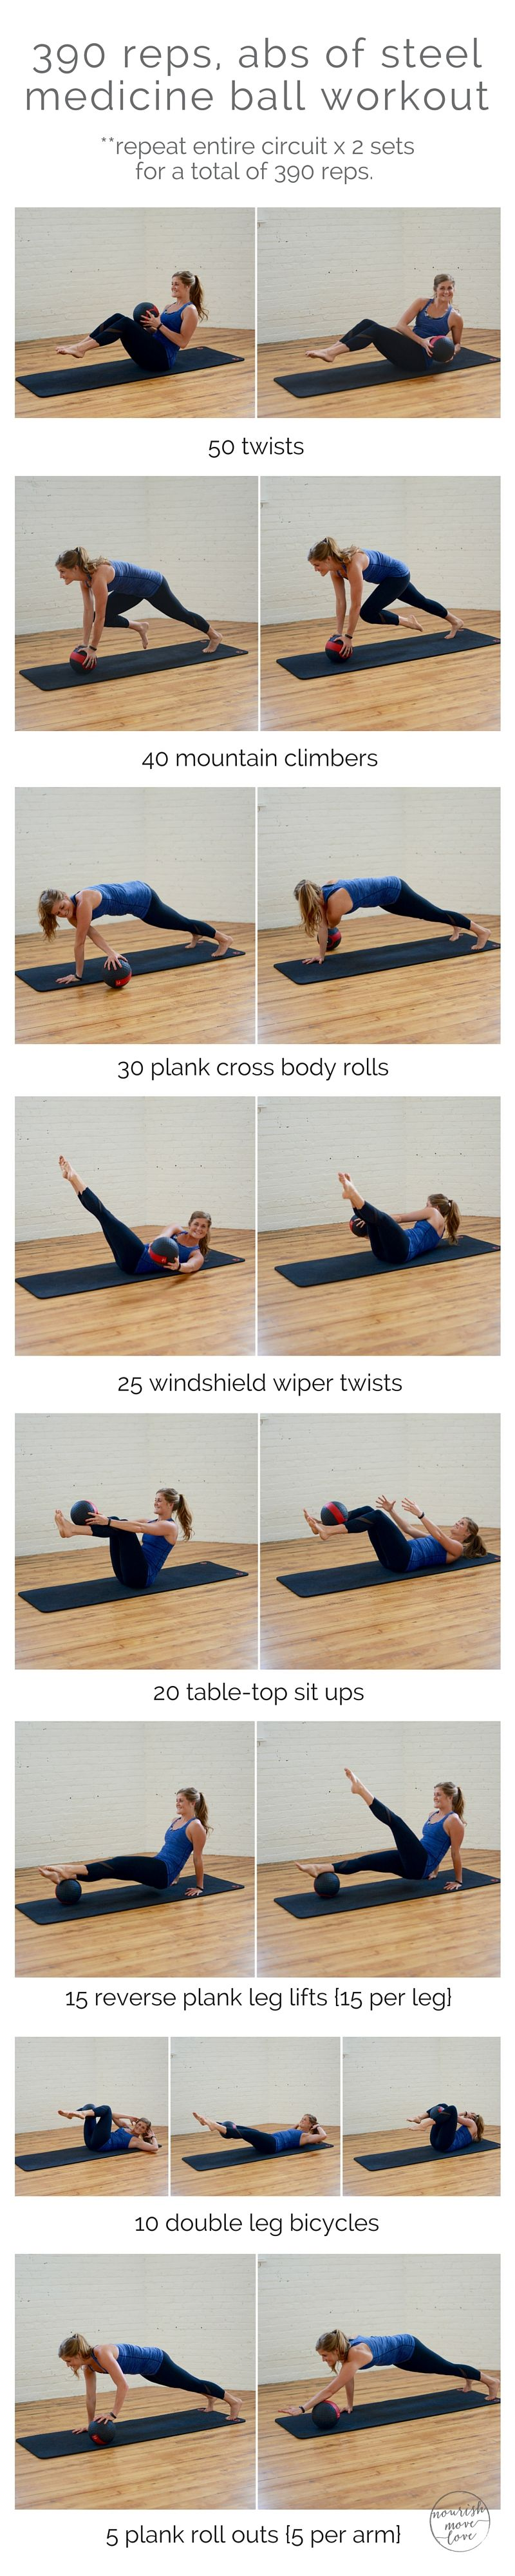 medicine ball workout routine pdf